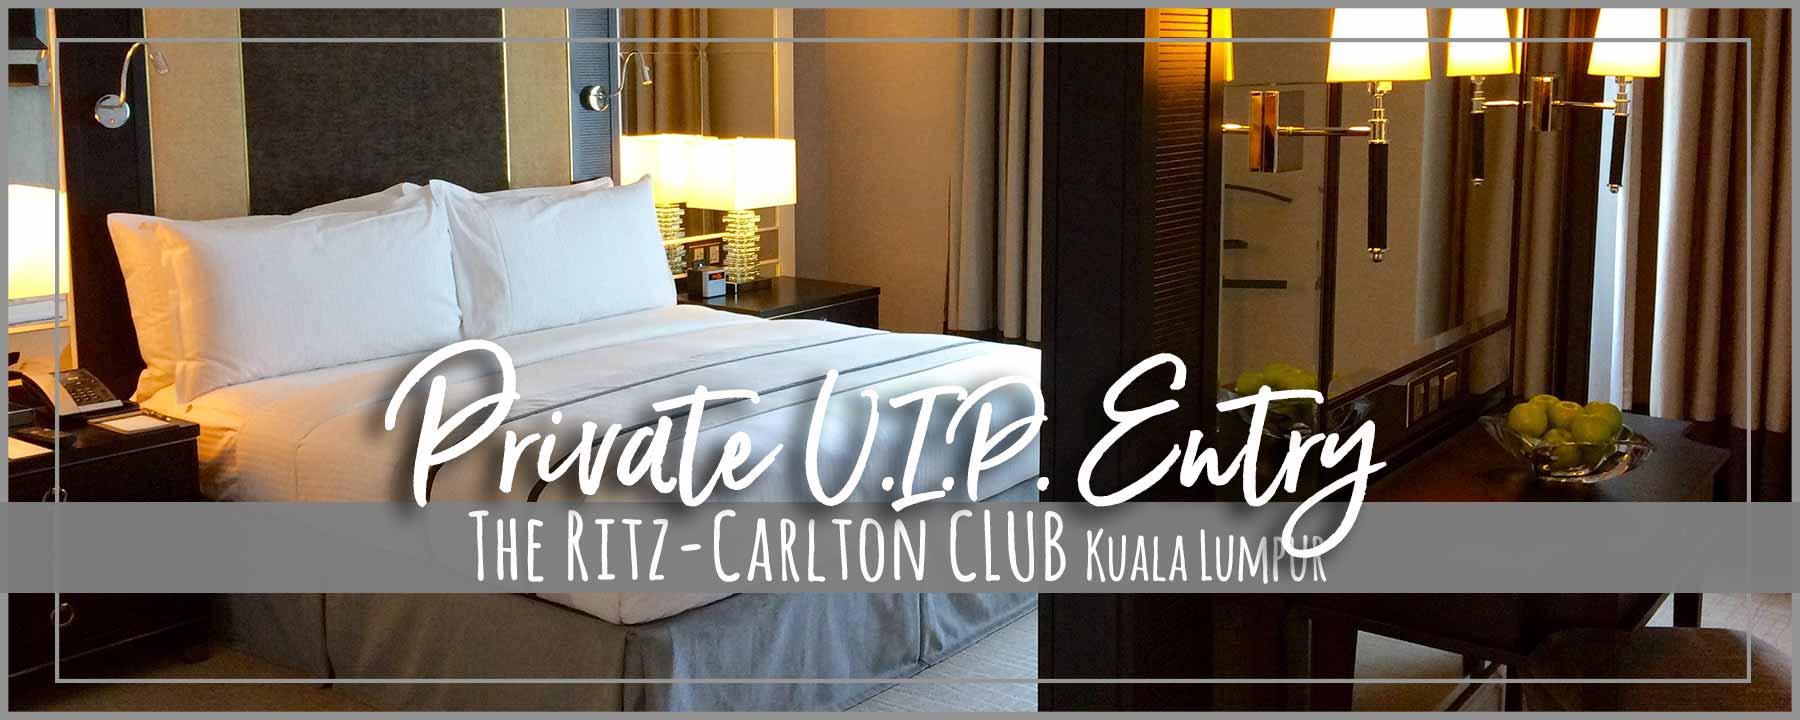 The Ritz-Carlton CLUB Kuala Lumpur | Exclusive V.I.P. Entry & Lift